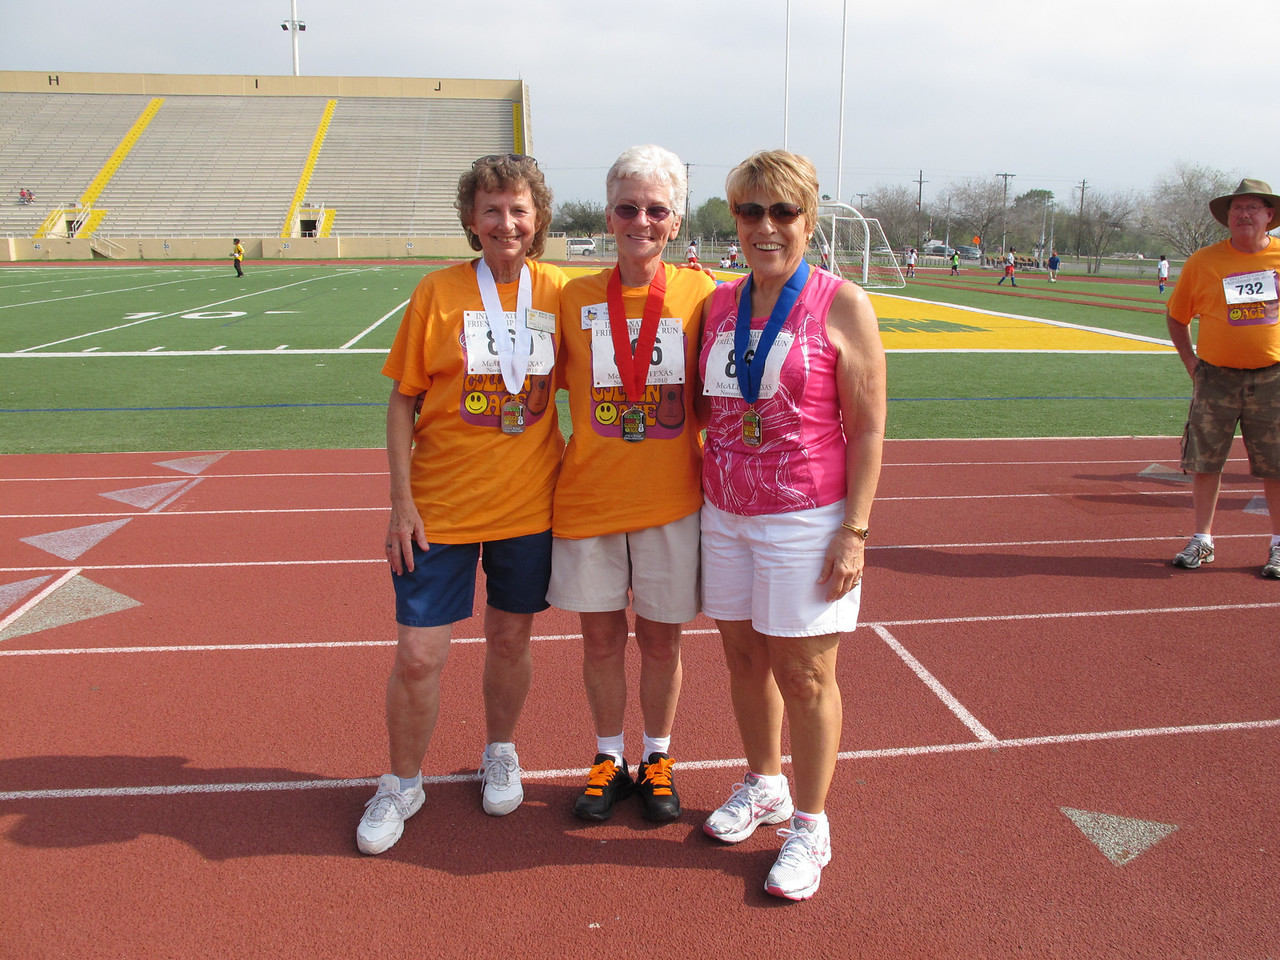 Racewalk Women 70-74 (L-R) 3rd Place - Shirley Shelton (McAllen Mobile), 2nd Place - Patty Yoder (El Valle Del Sol), 1st Place - Mary Ann Jamieson (Bit O Heaven)